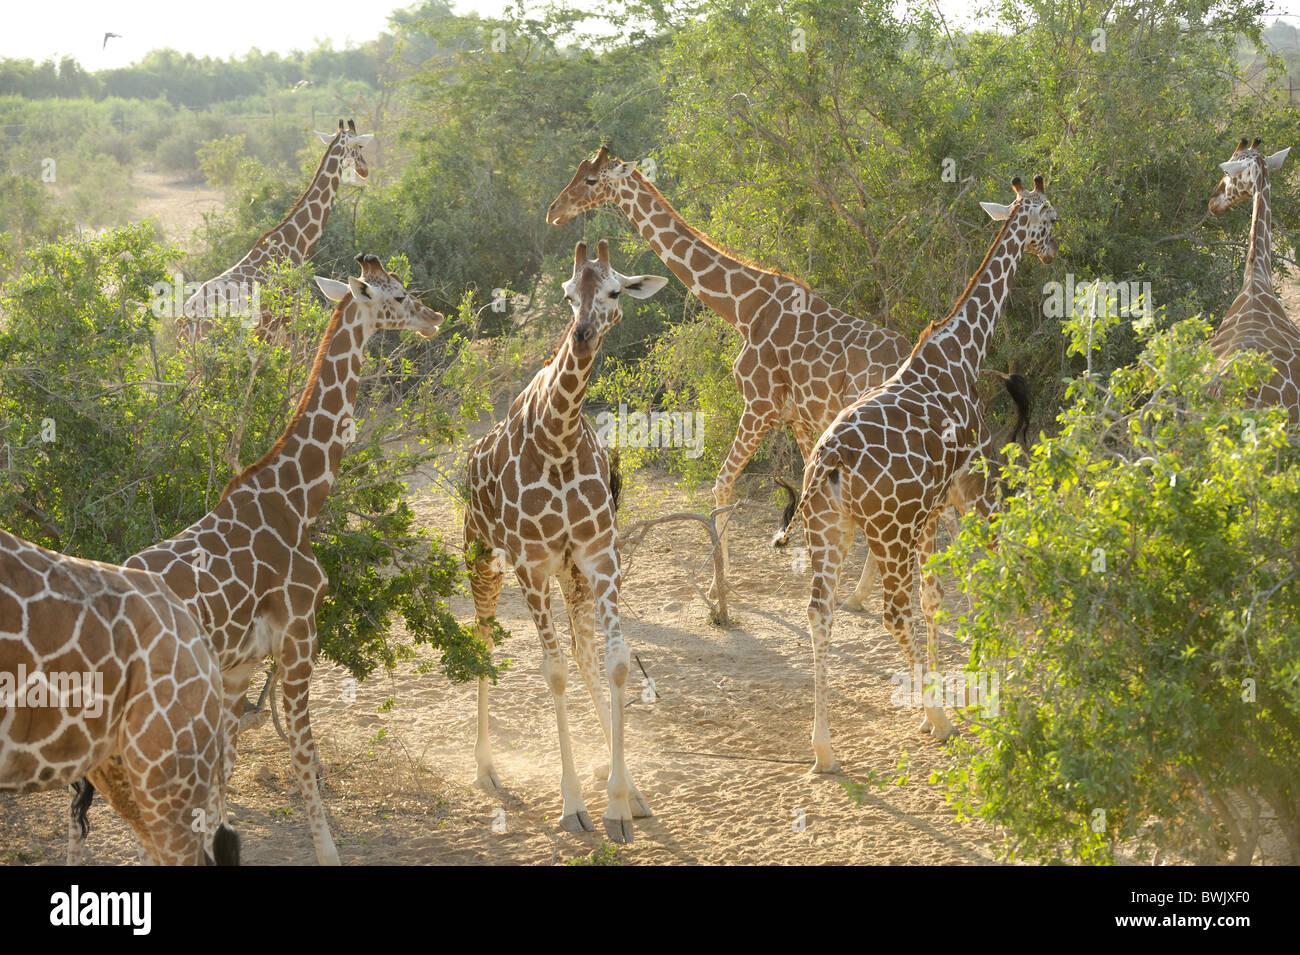 Alcune giraffe (Giraffa camelopardalis) tra Acacia Thorn trees su Sir Bani Yas Island, EMIRATI ARABI UNITI Immagini Stock